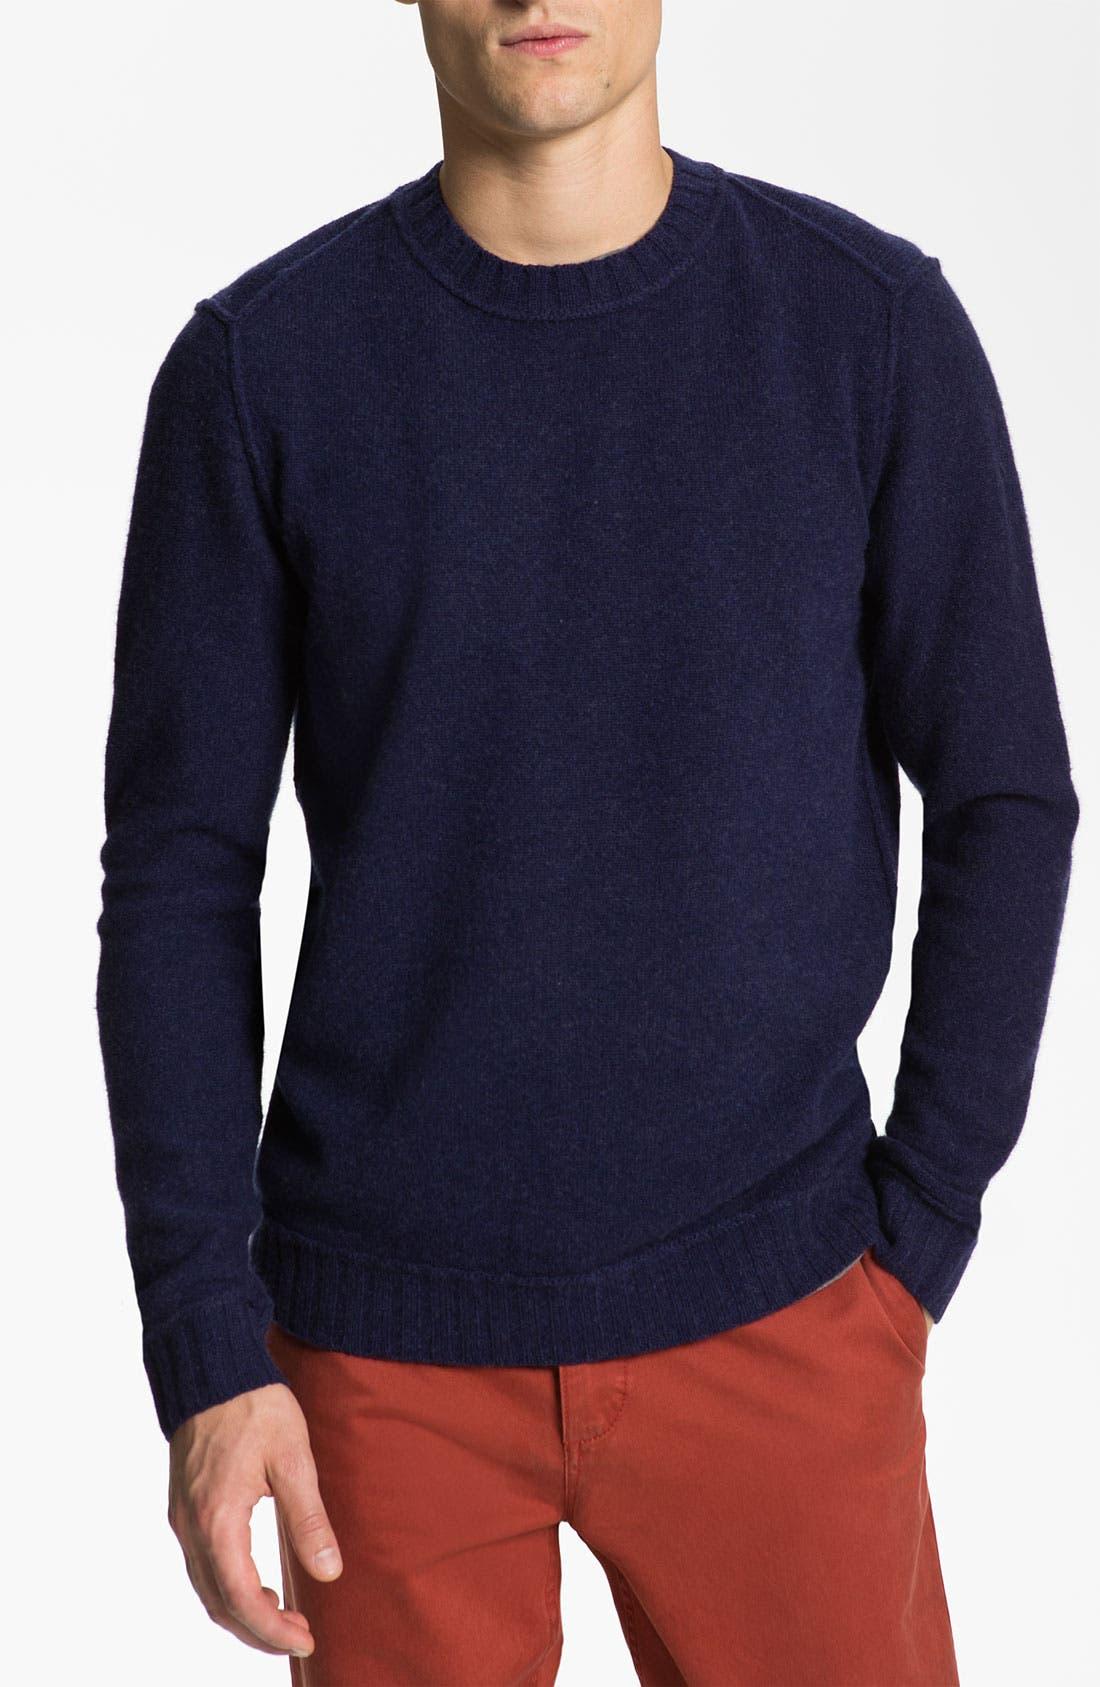 Alternate Image 1 Selected - BOSS Orange Wool Crewneck Sweater